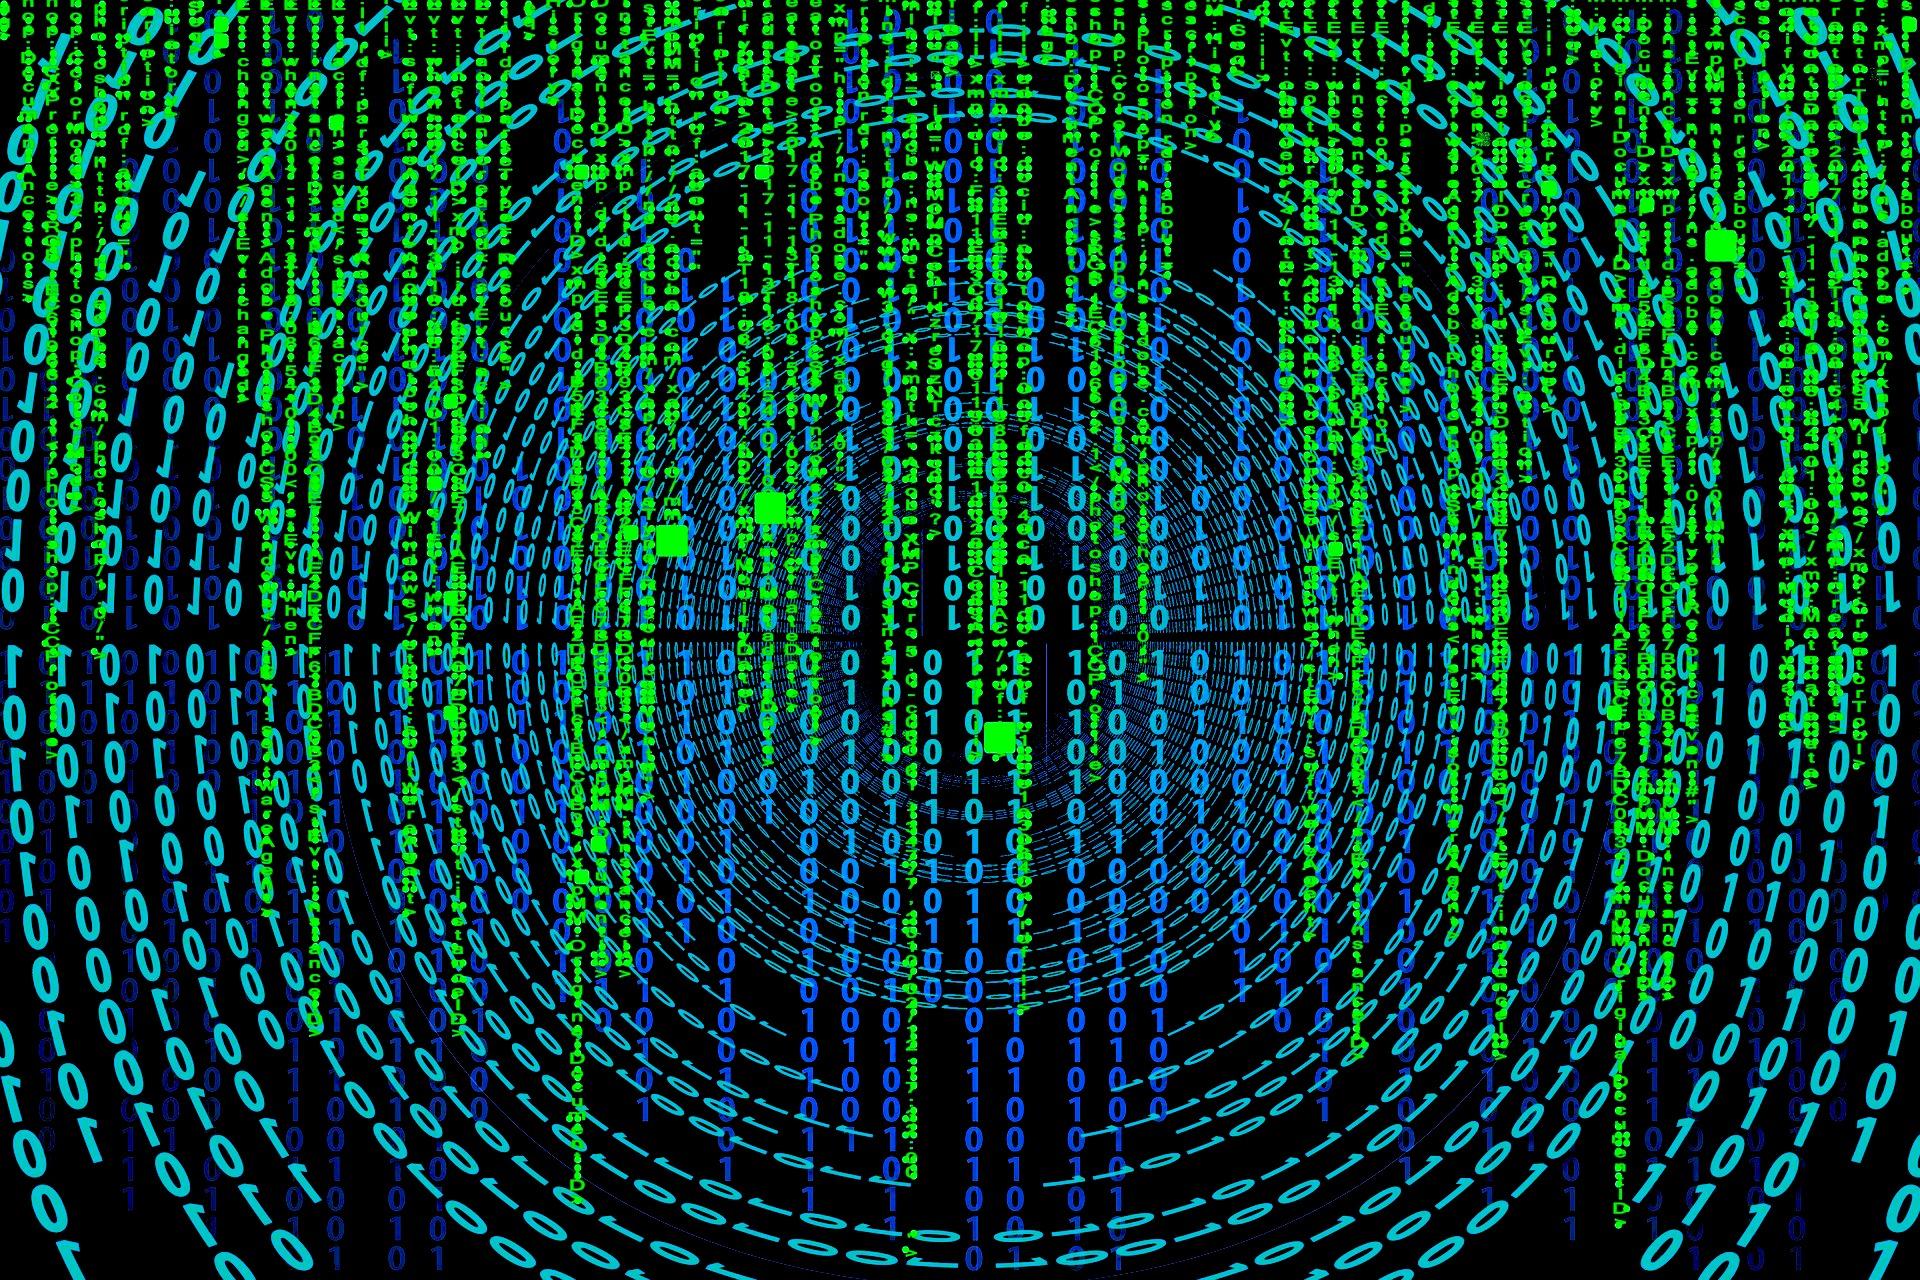 As Hadoop wanes, Cloudera aims to accelerate multicloud data science pipelines